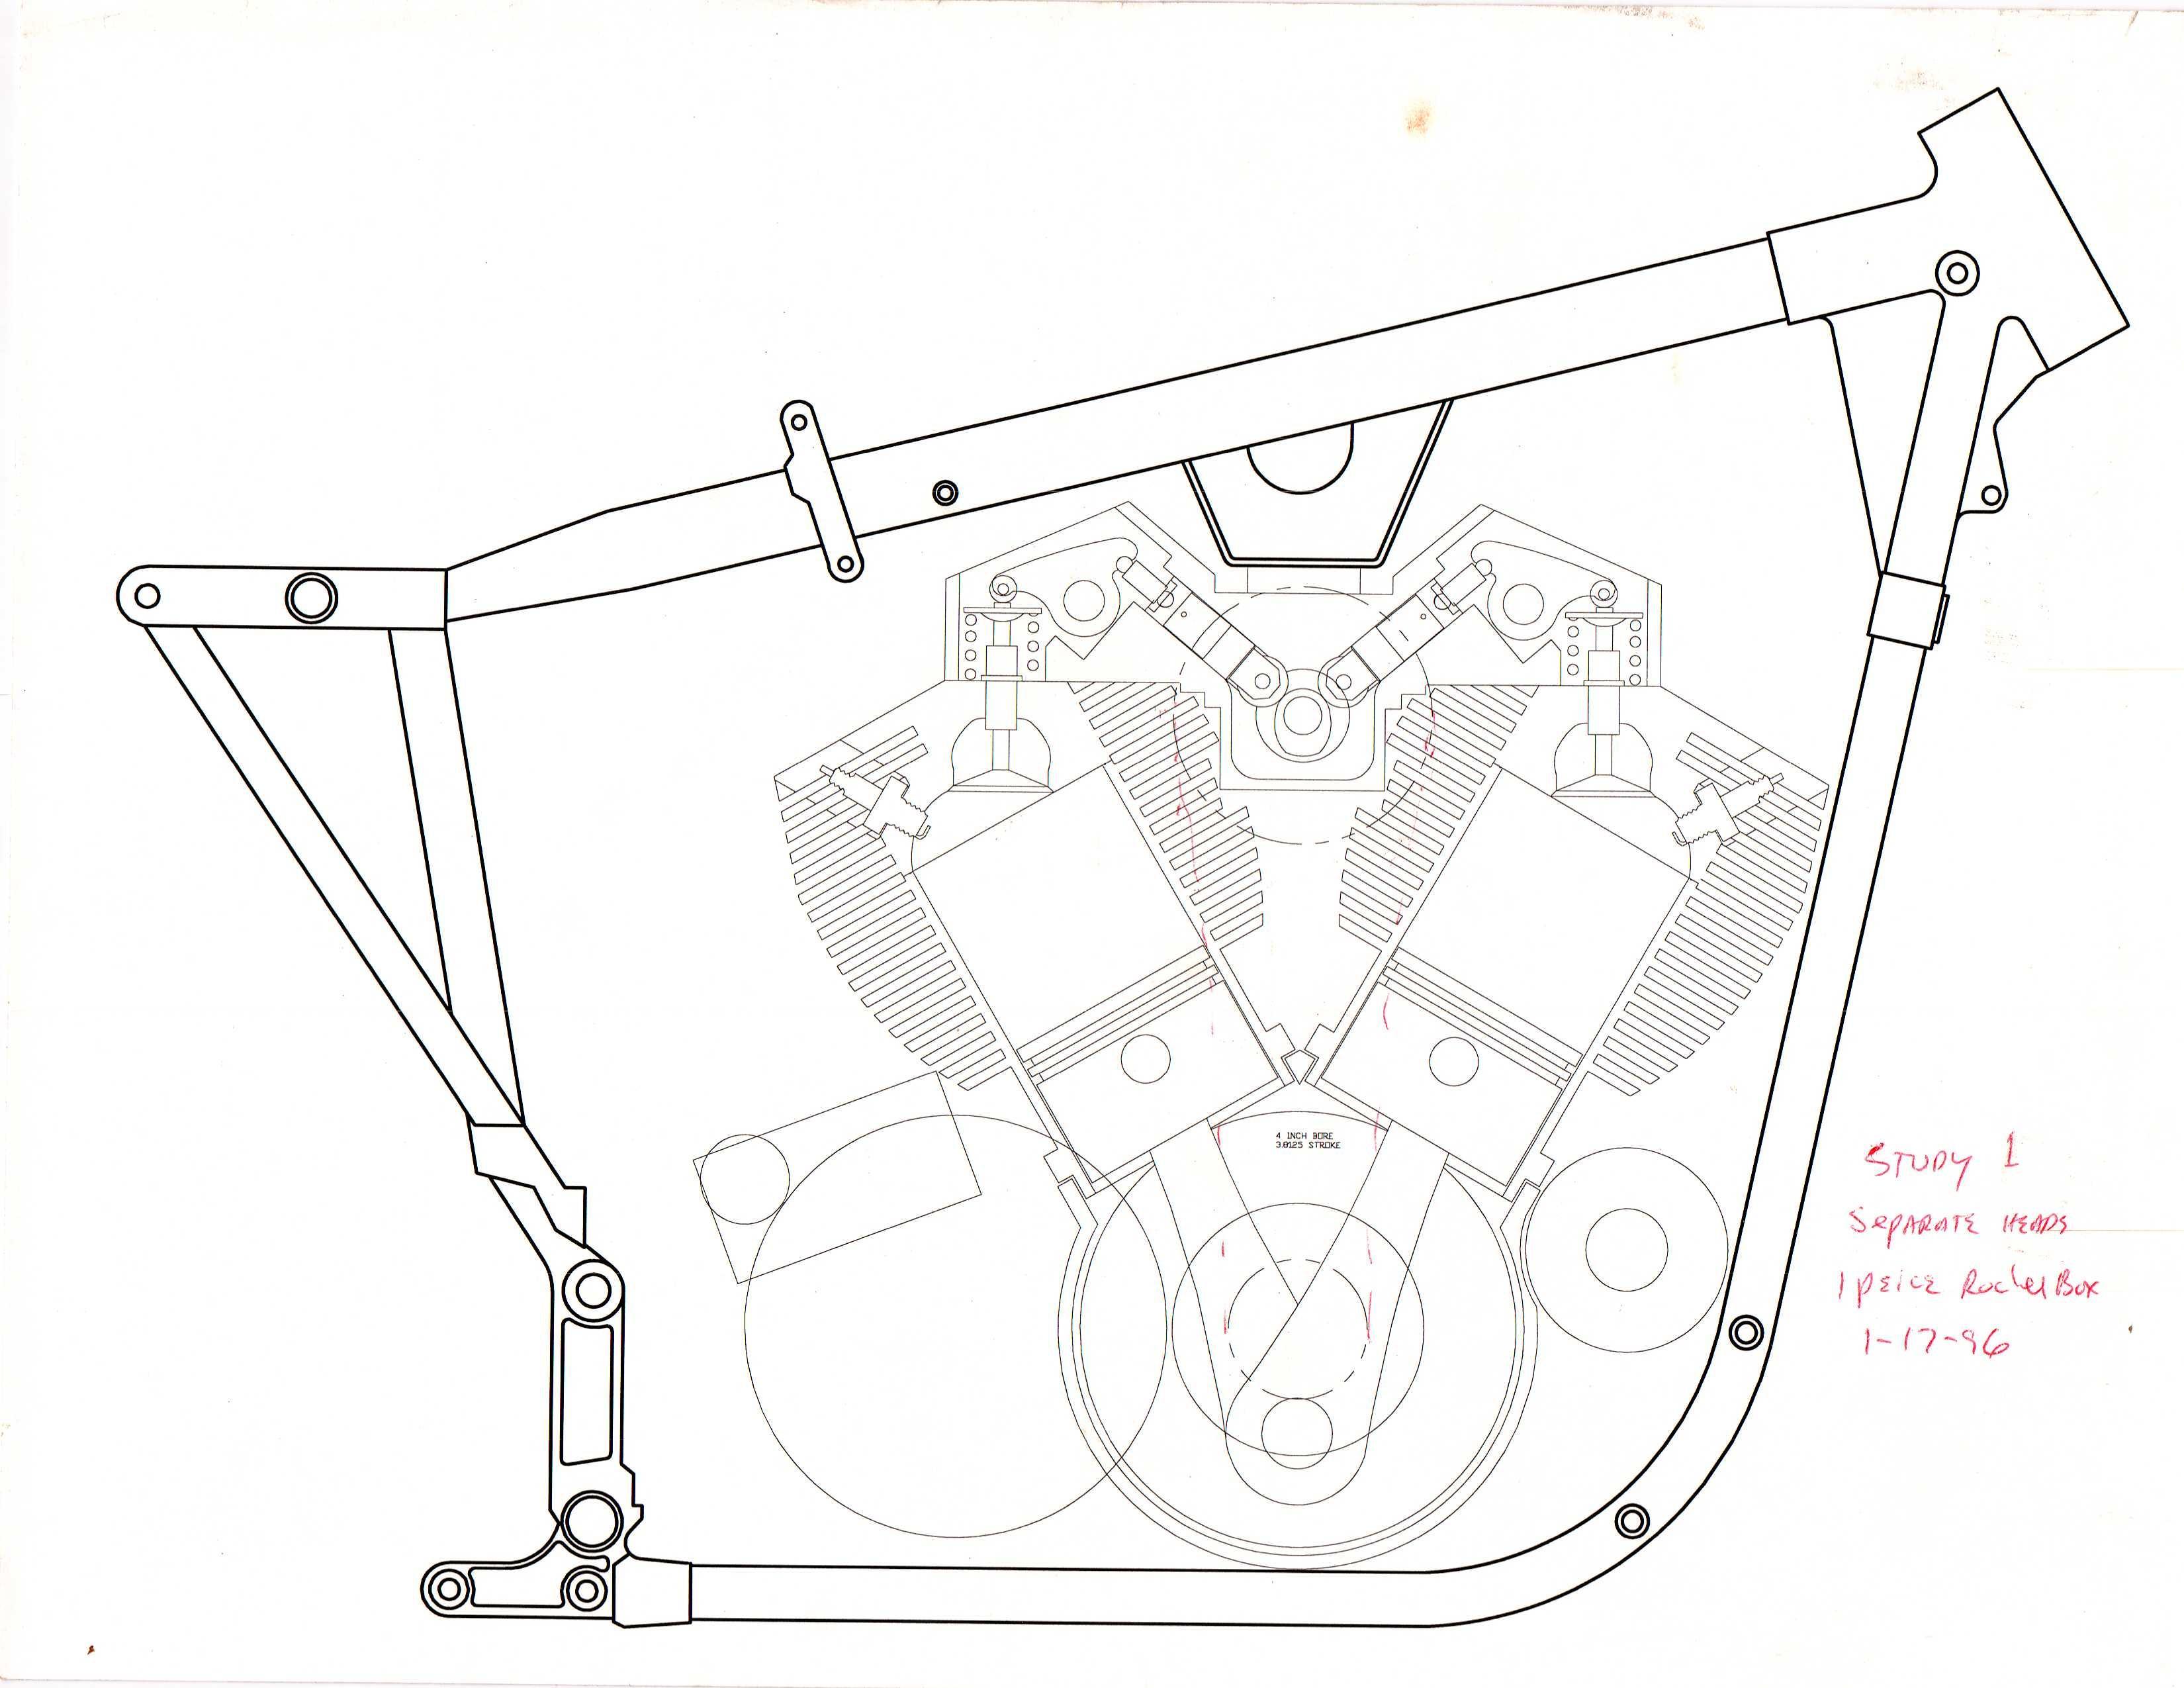 Iron sportster 1996 01 17 high cam check plot